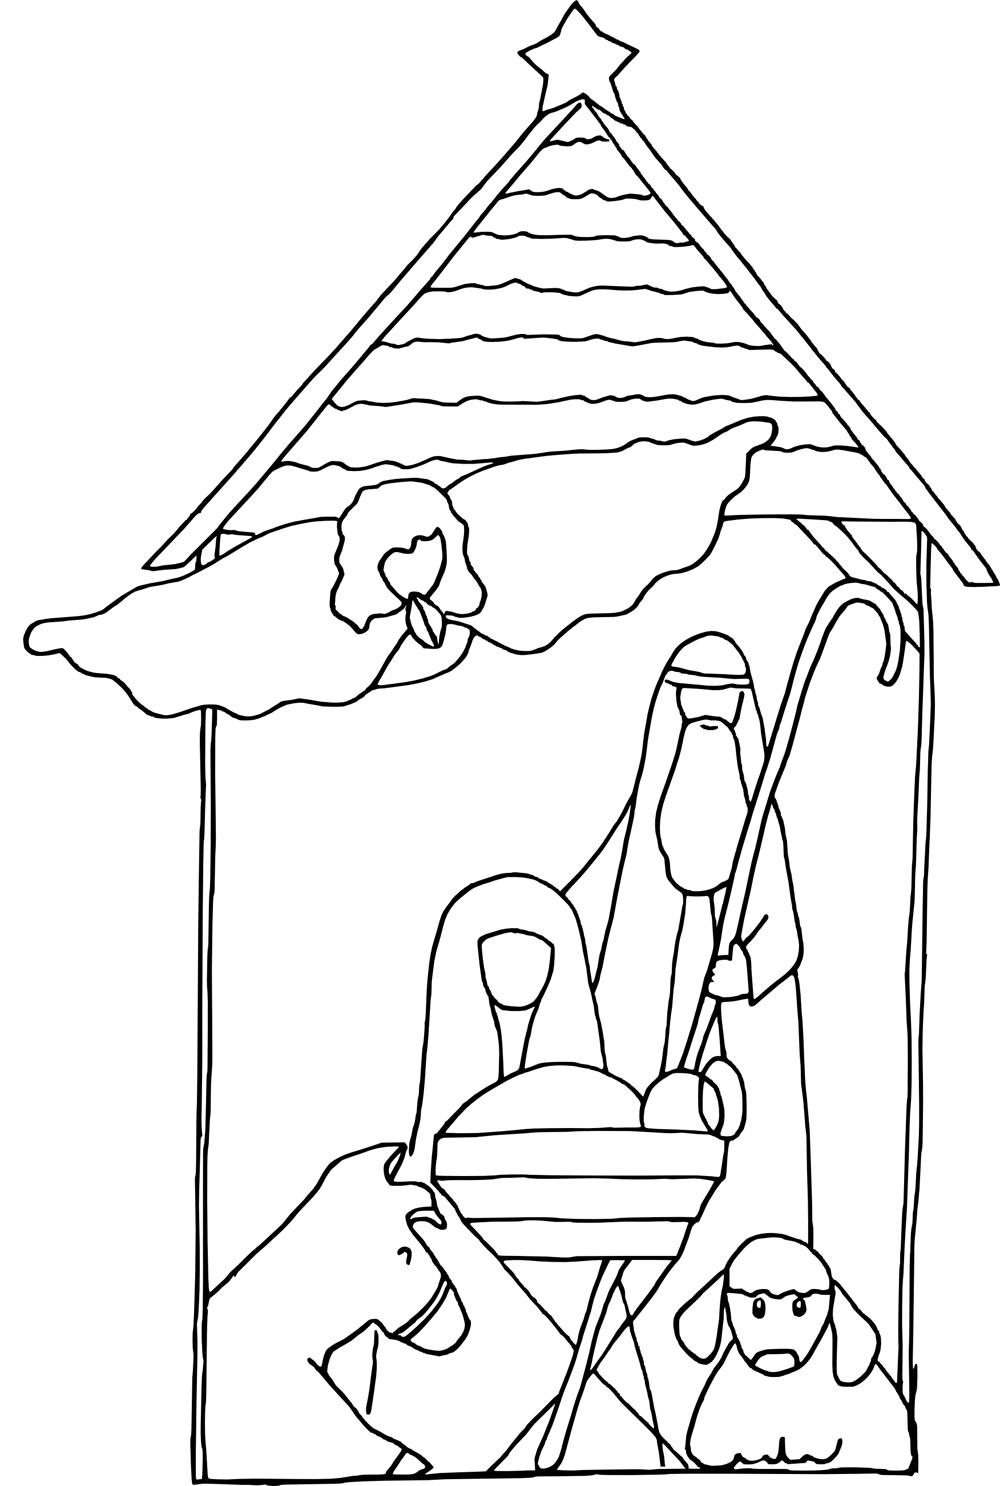 baby jesus coloring sheet baby jesus coloring pages best coloring pages for kids coloring sheet jesus baby